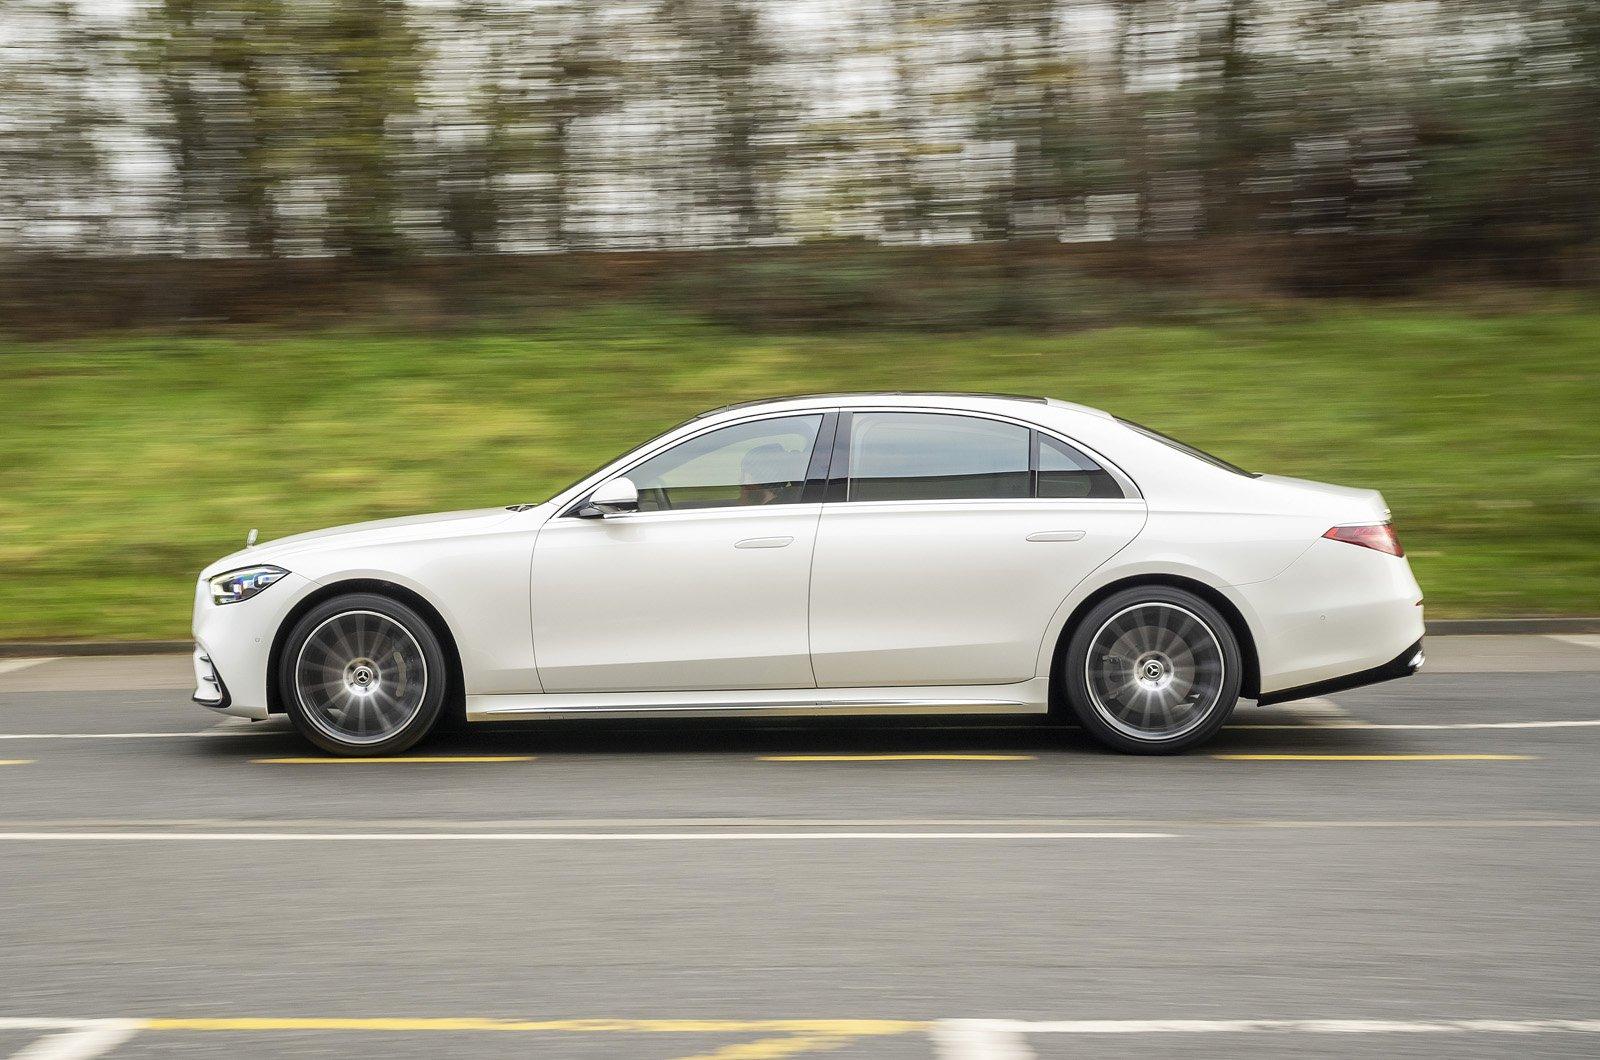 Mercedes S-Class 2021 side